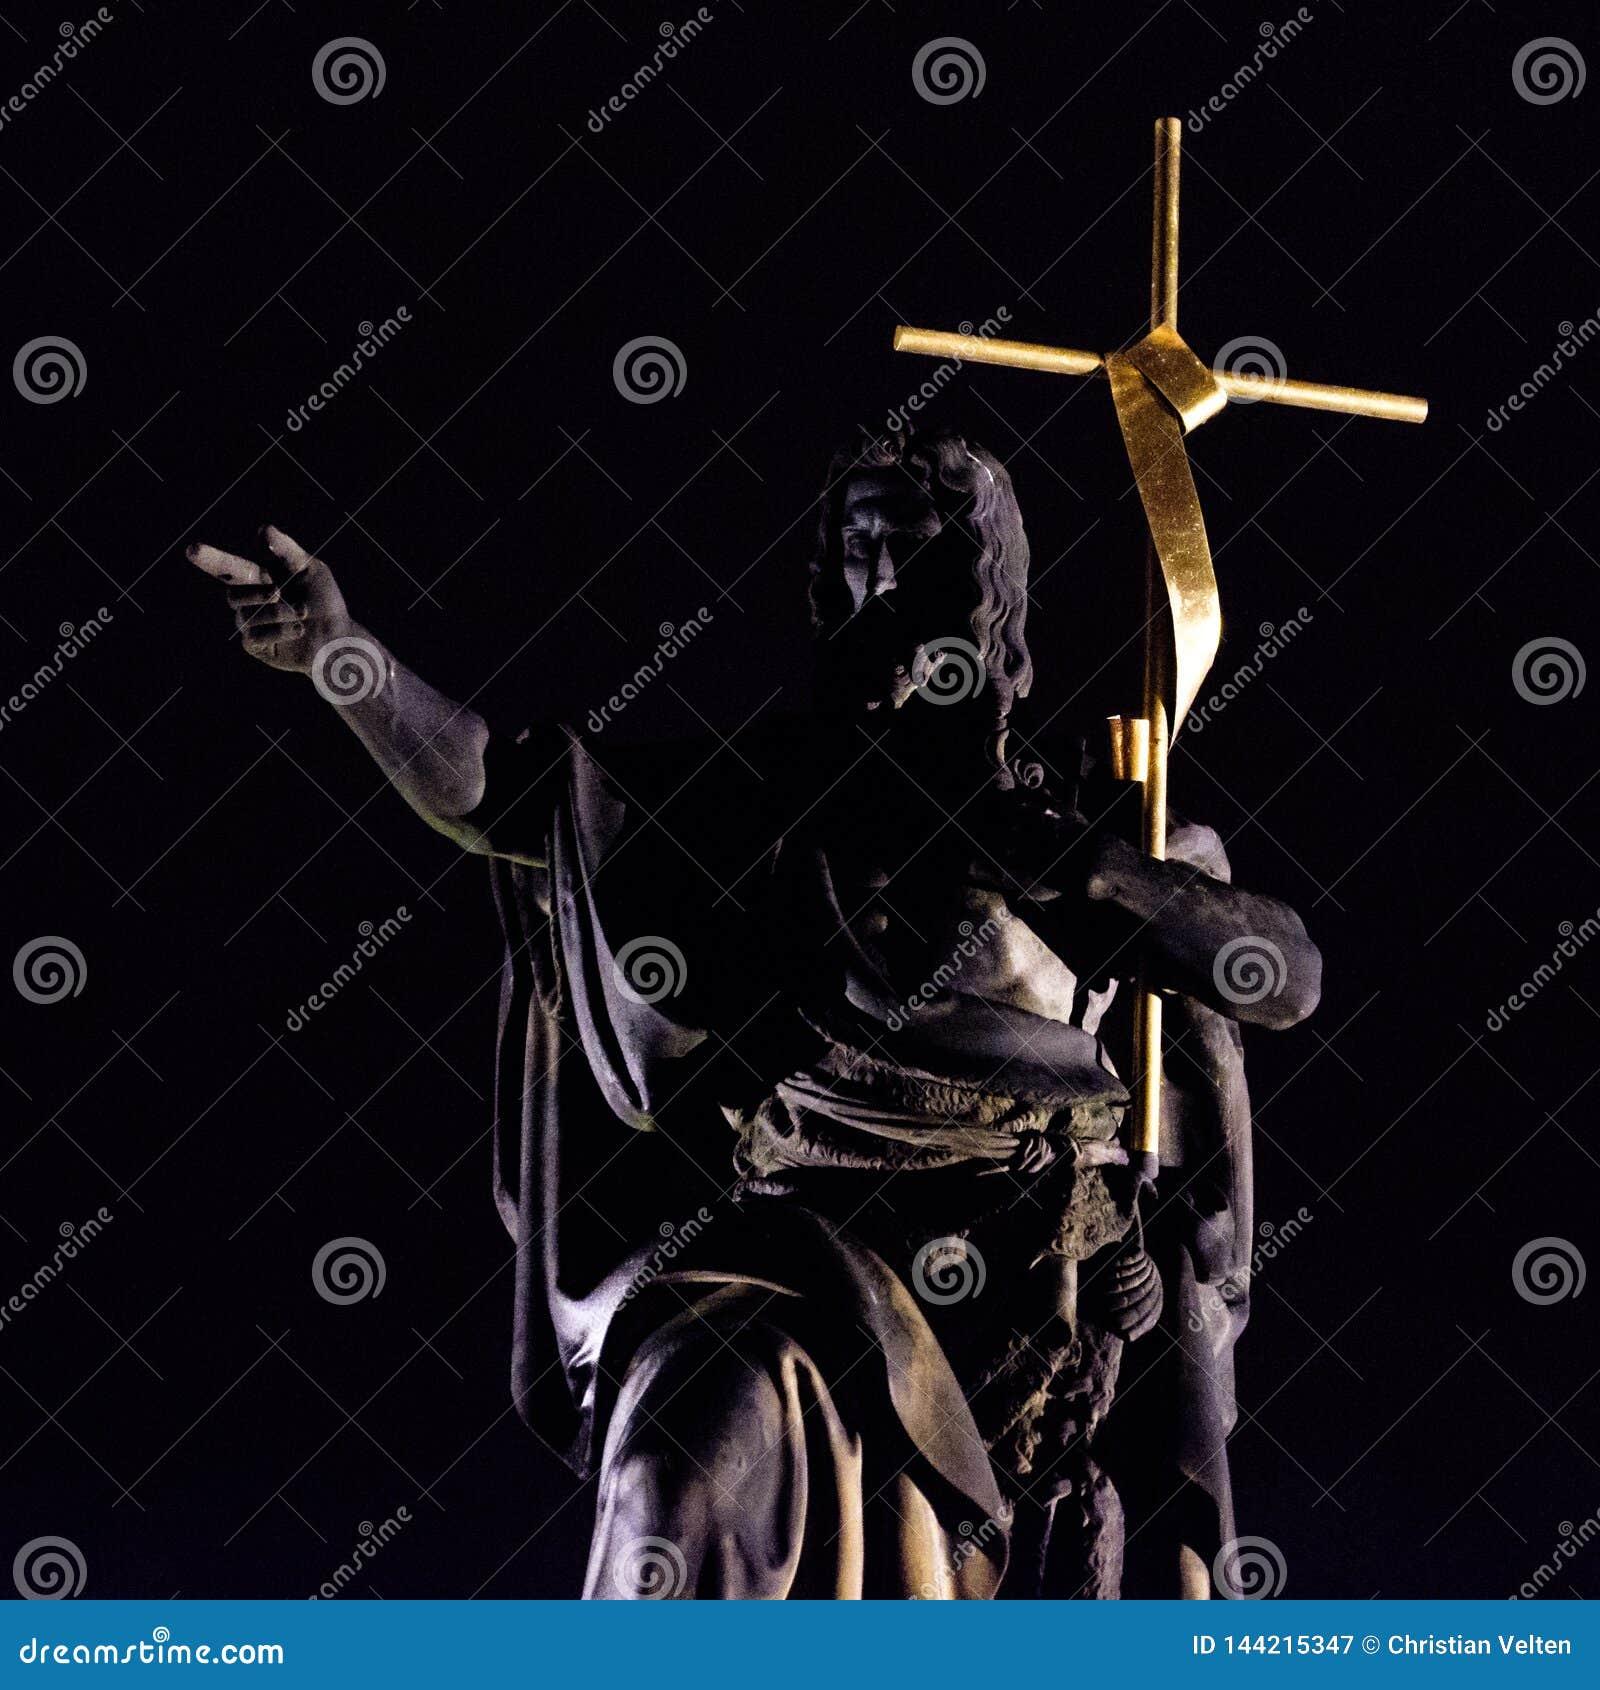 Statue of a bridge saint holding a large golden cross at night